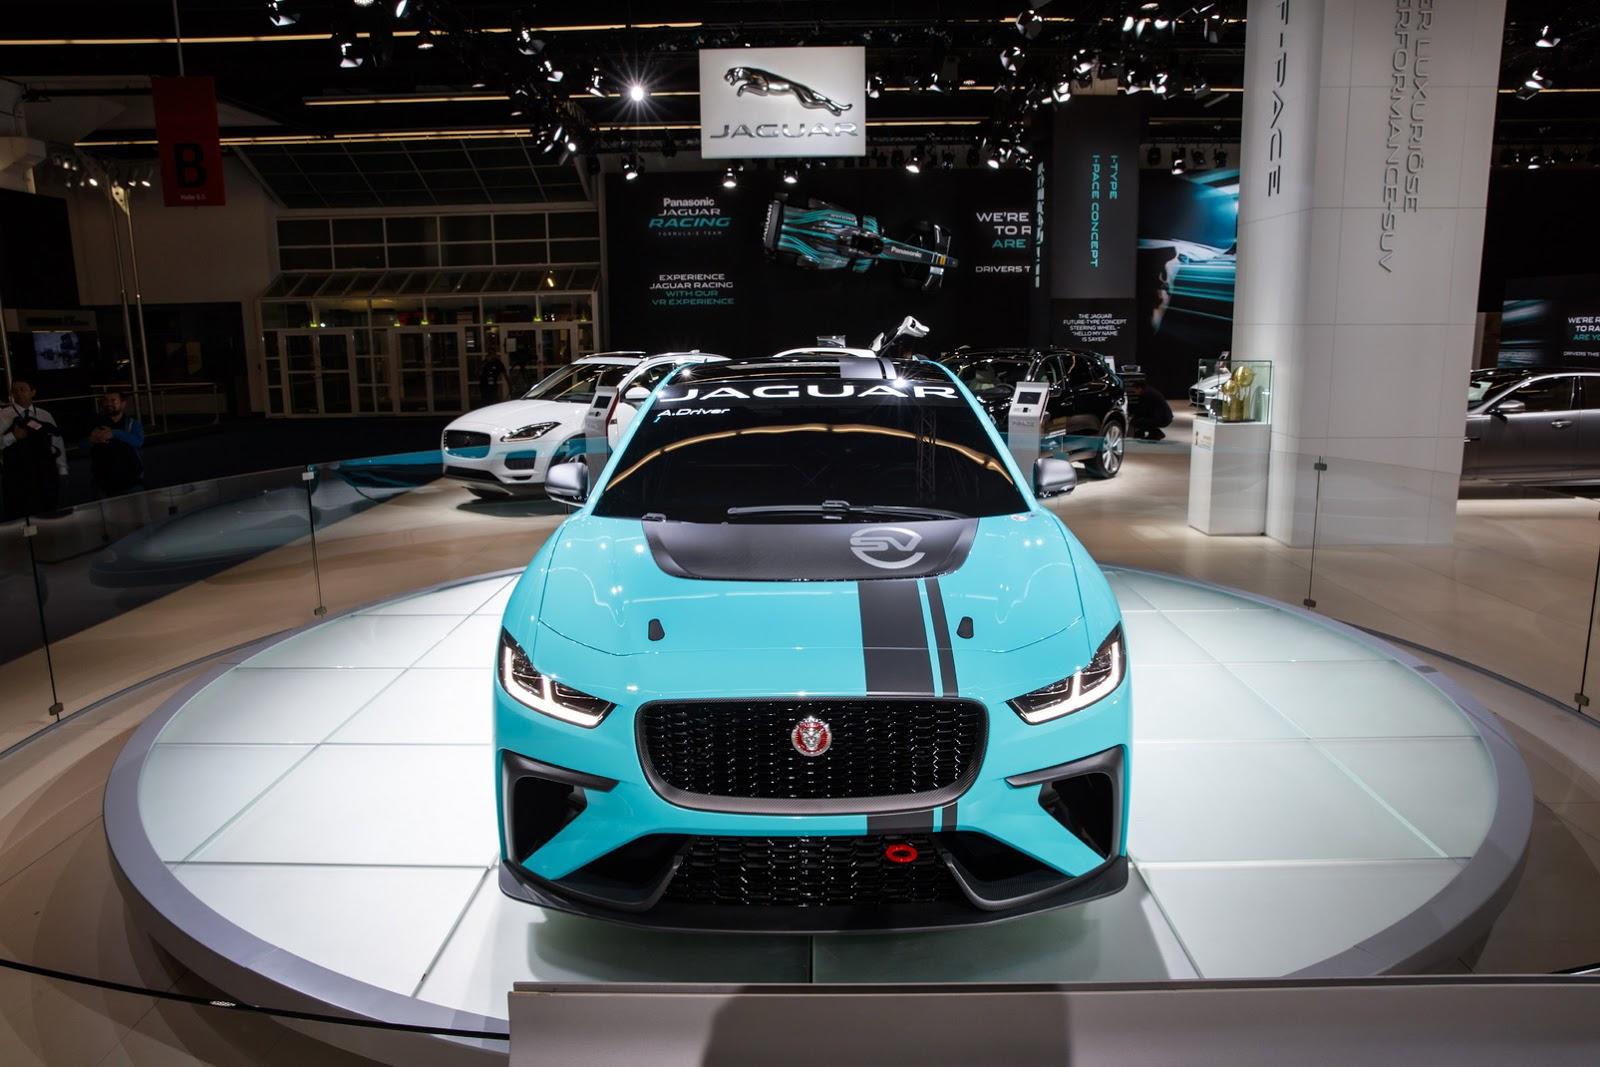 jaguar-ipace-race-car-iaa-5